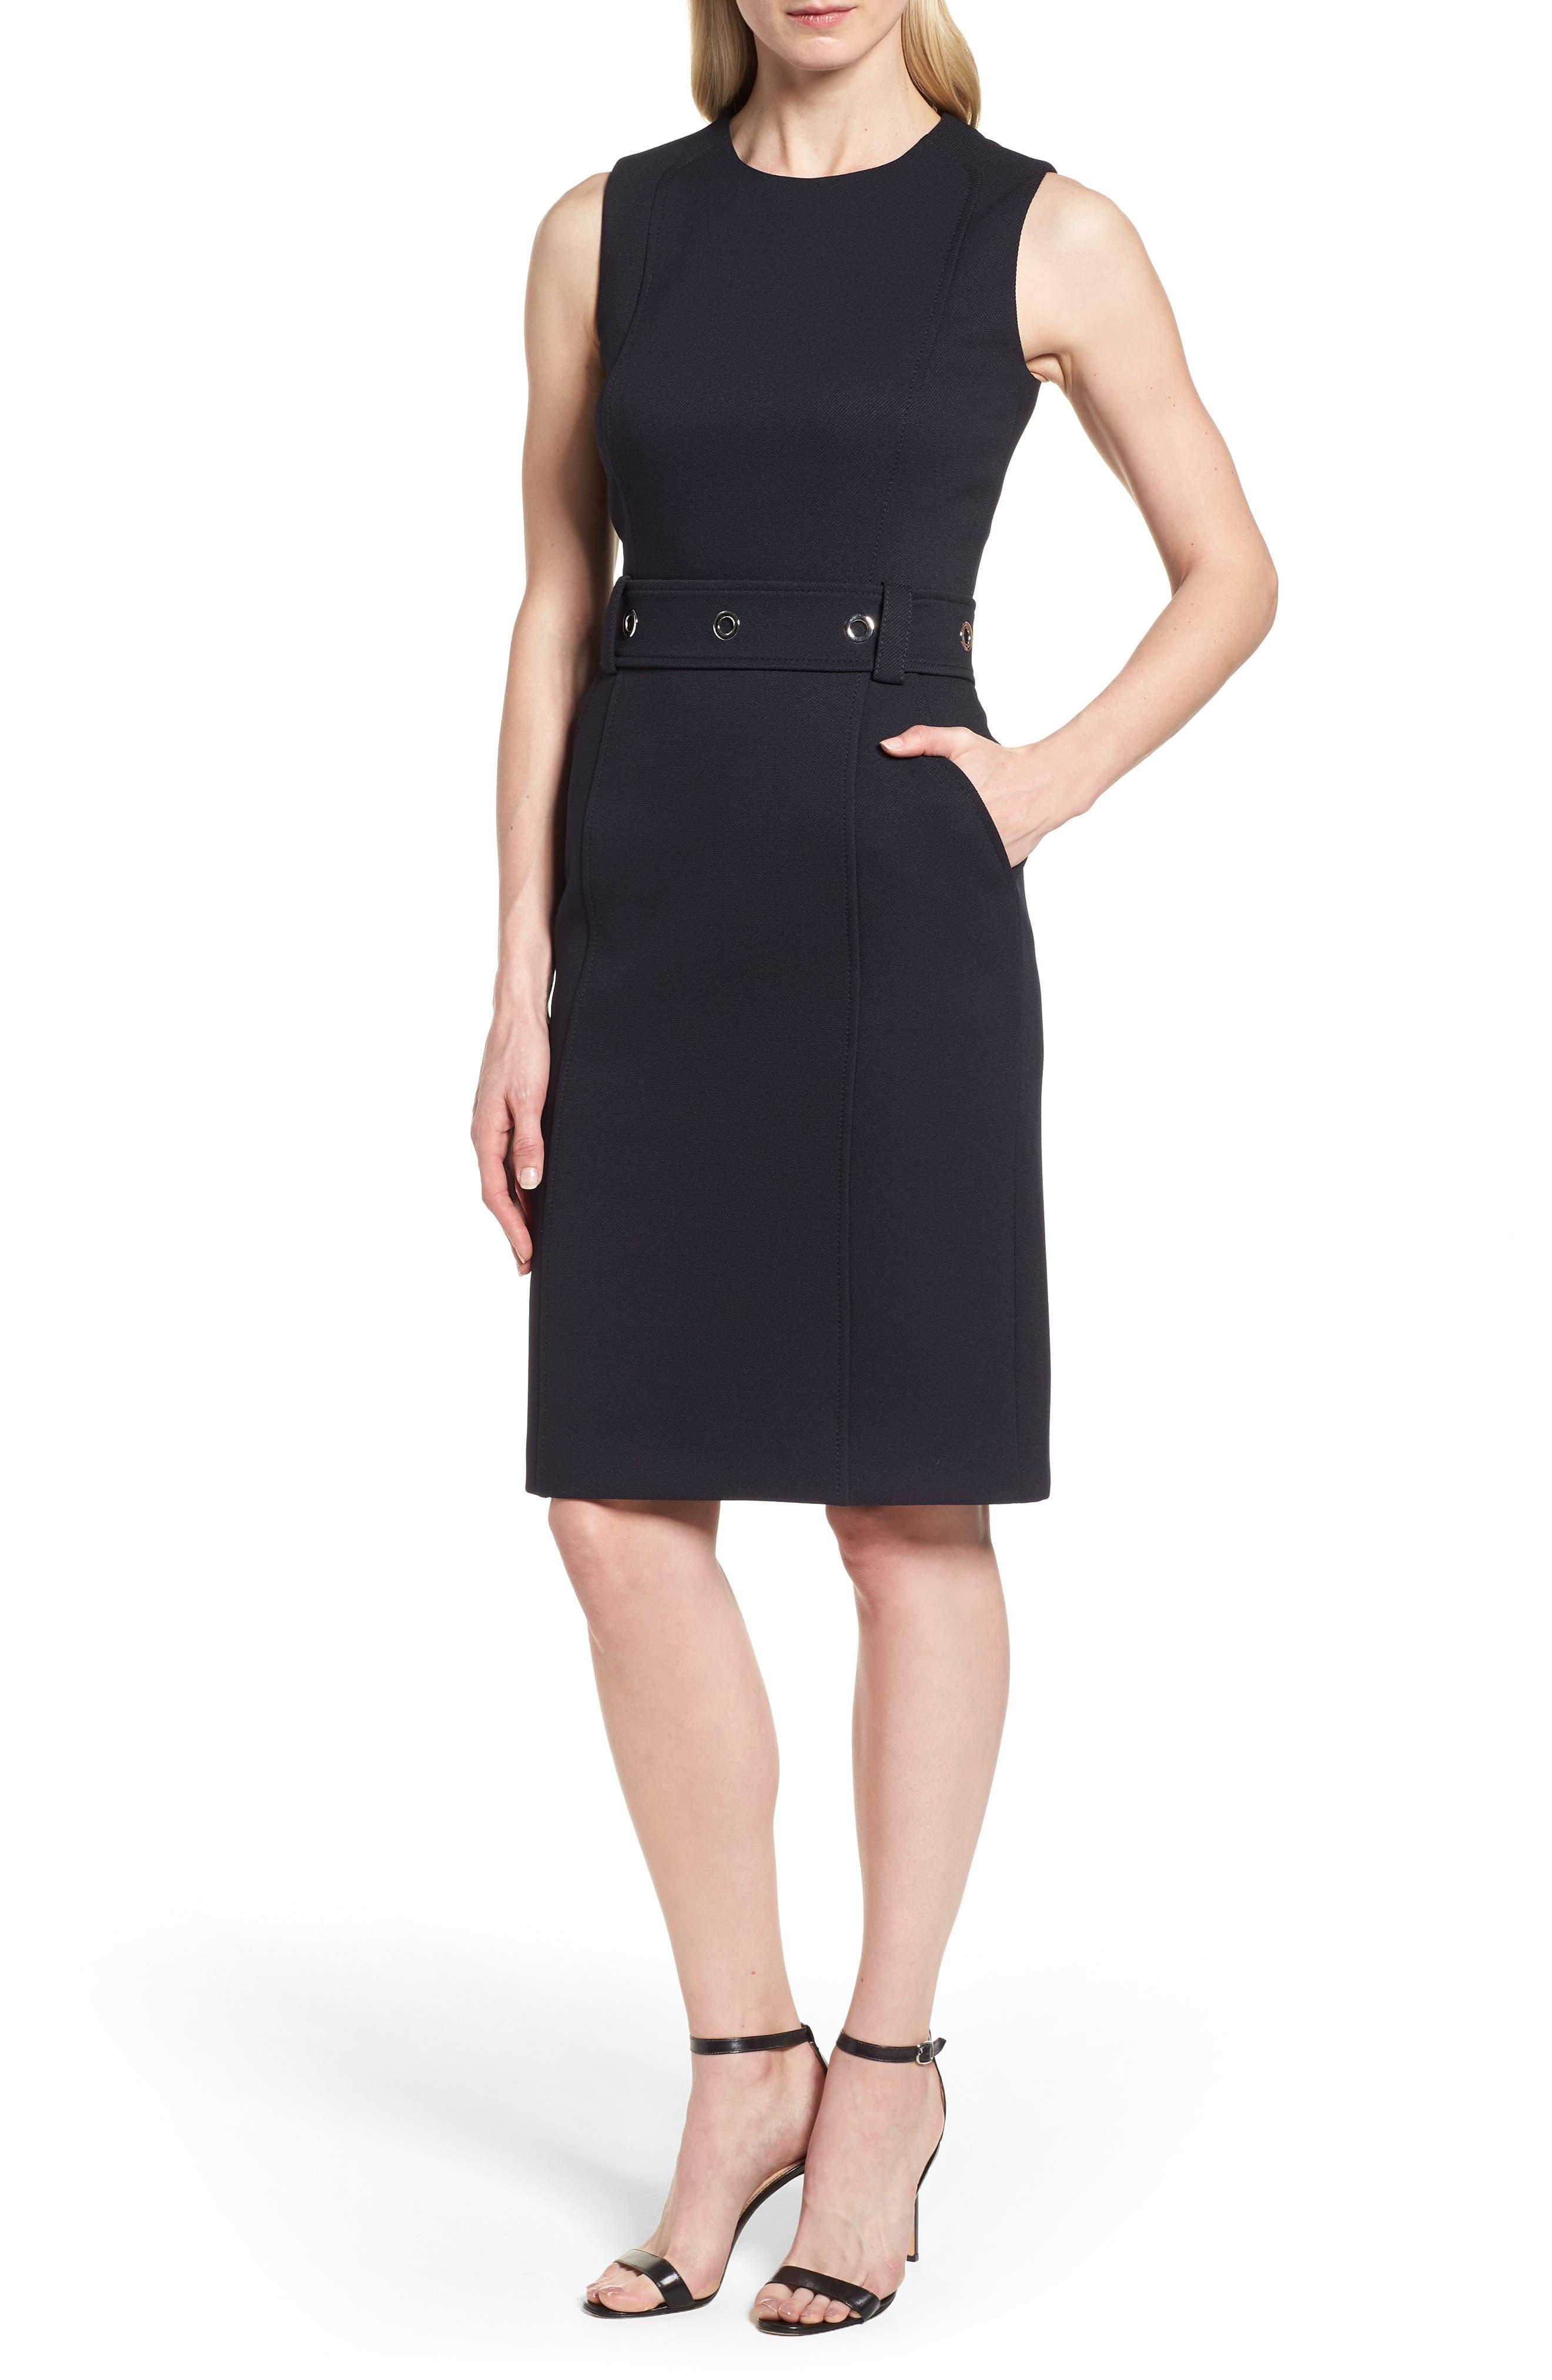 Duleama Belted Sheath Dress,                             Main thumbnail 1, color,                             480